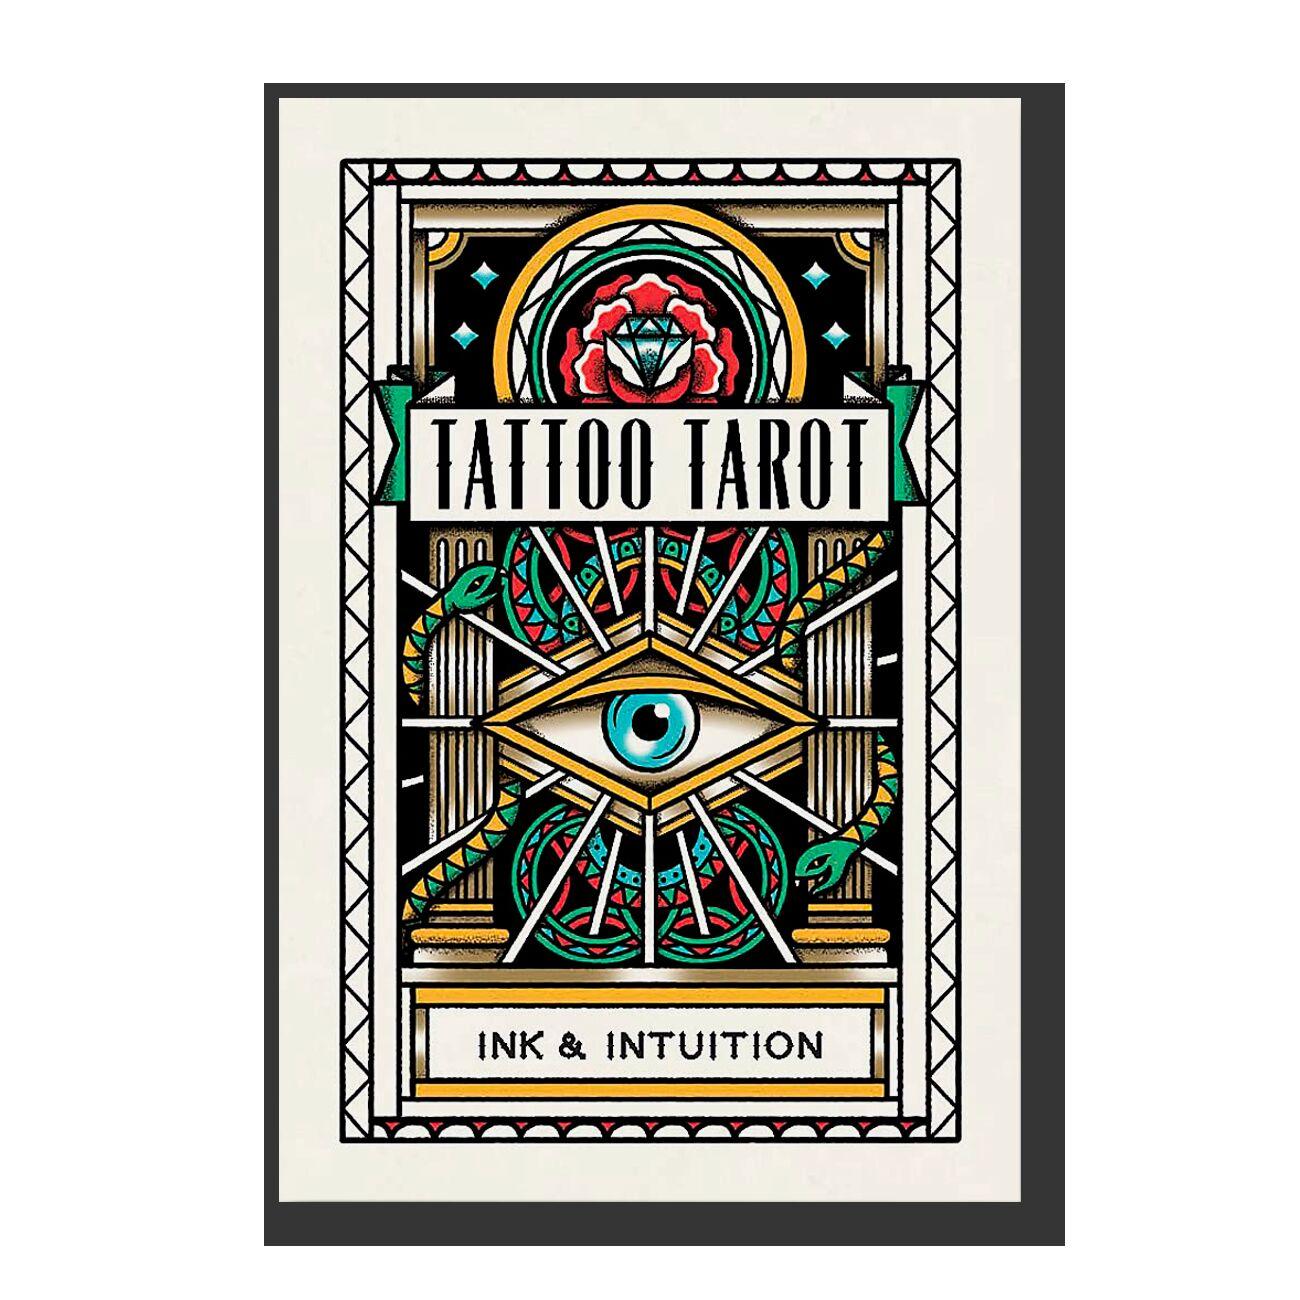 Tattoo: Ink & Intuiti on Cards